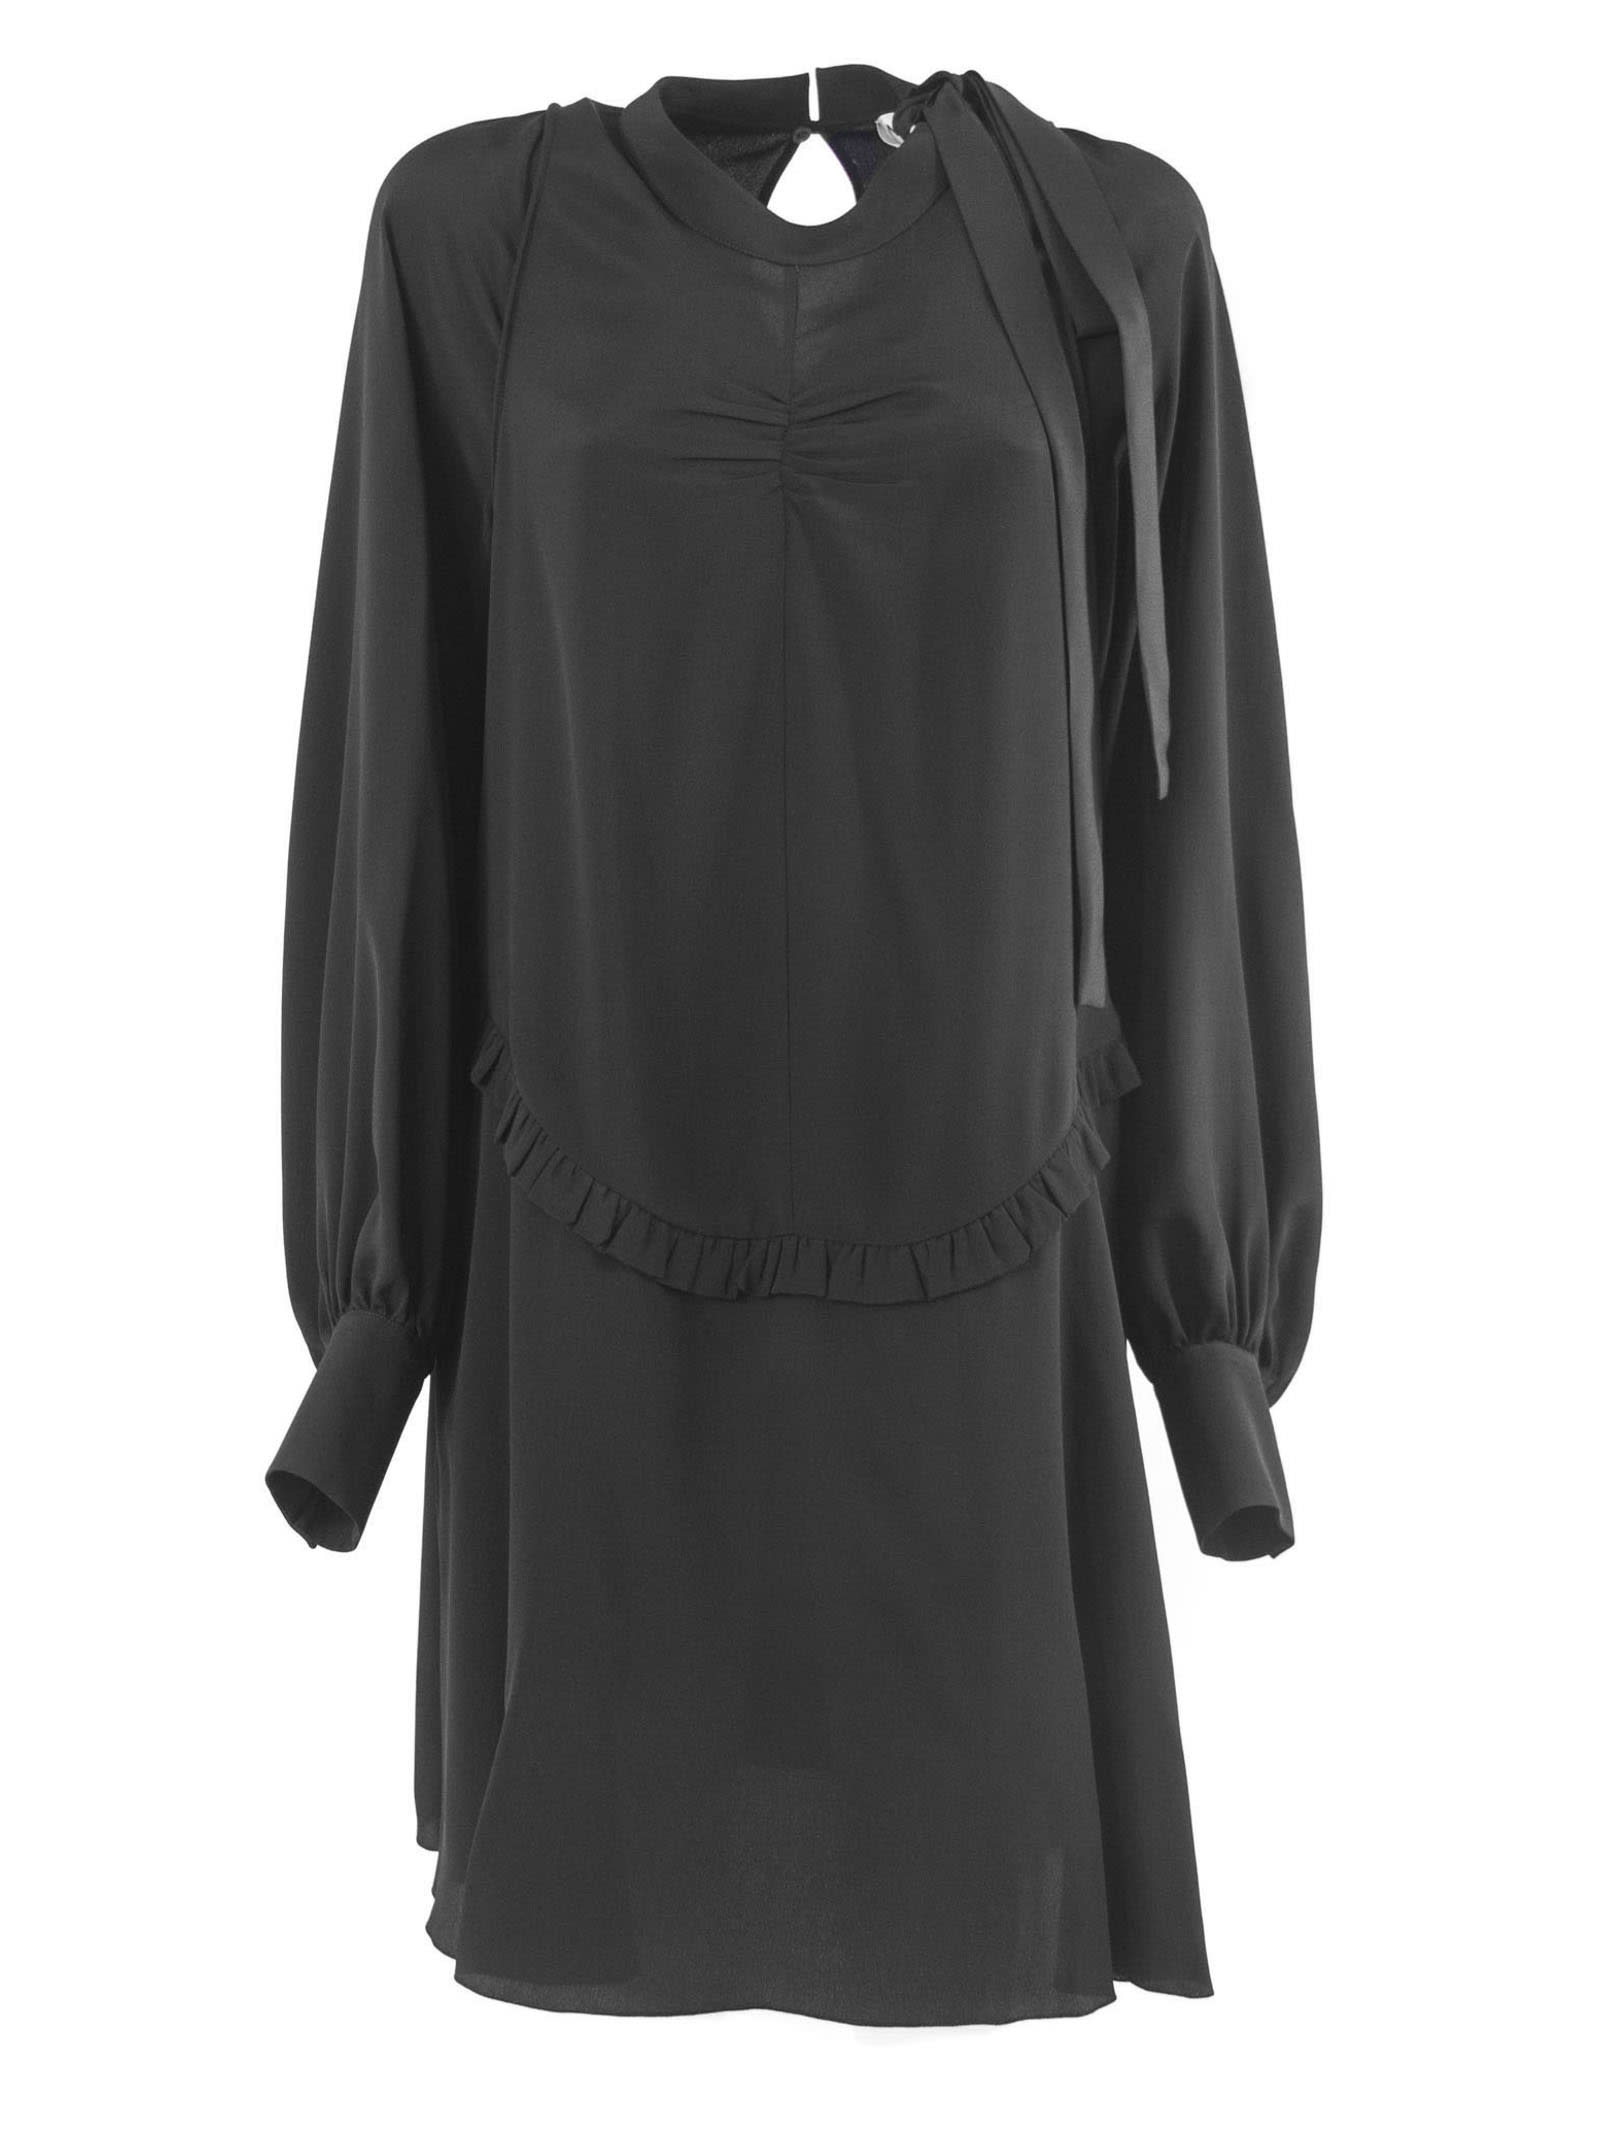 N.21 Dress In Black Silk Blend